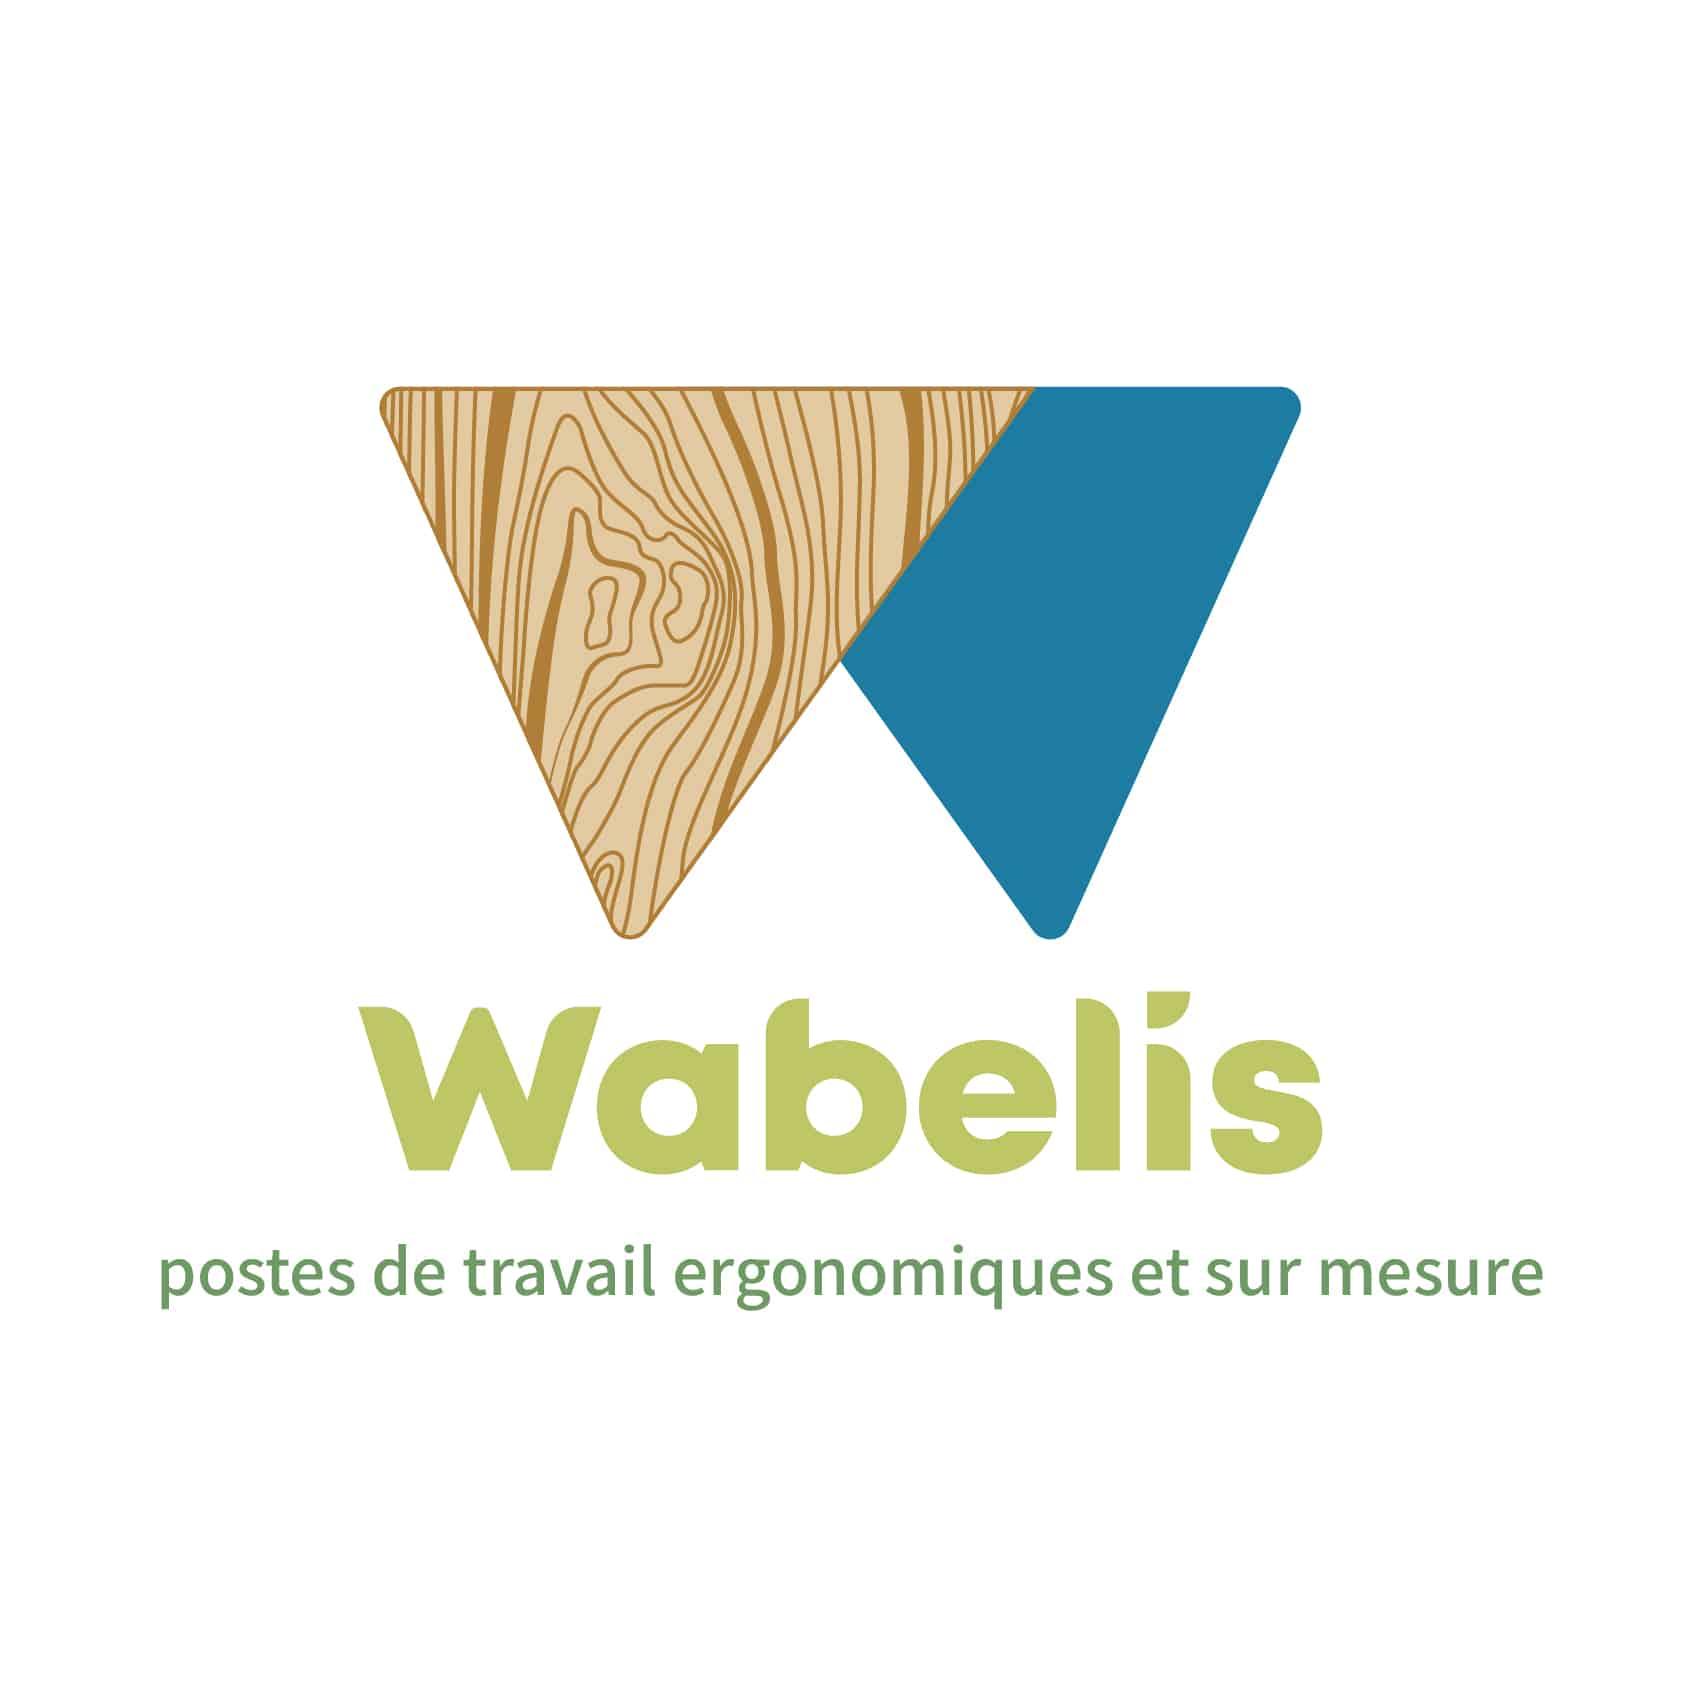 WABELIS